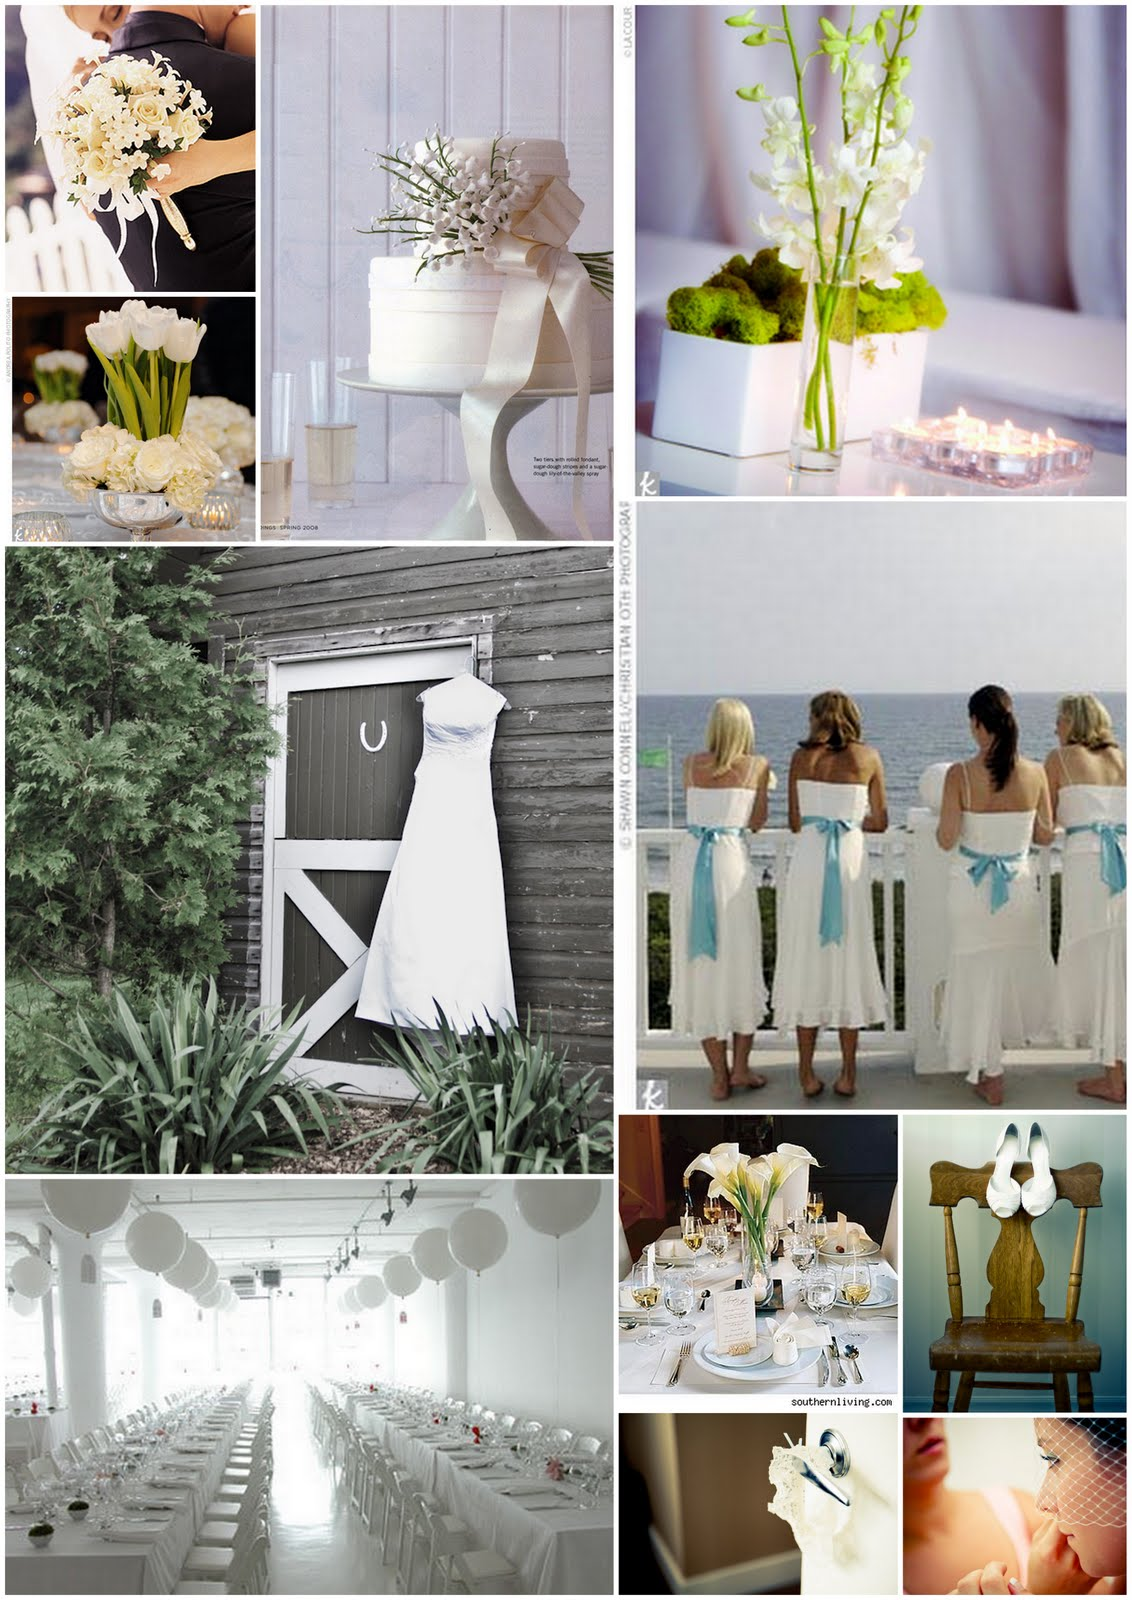 Wedding Dress: Robin Cimitruk